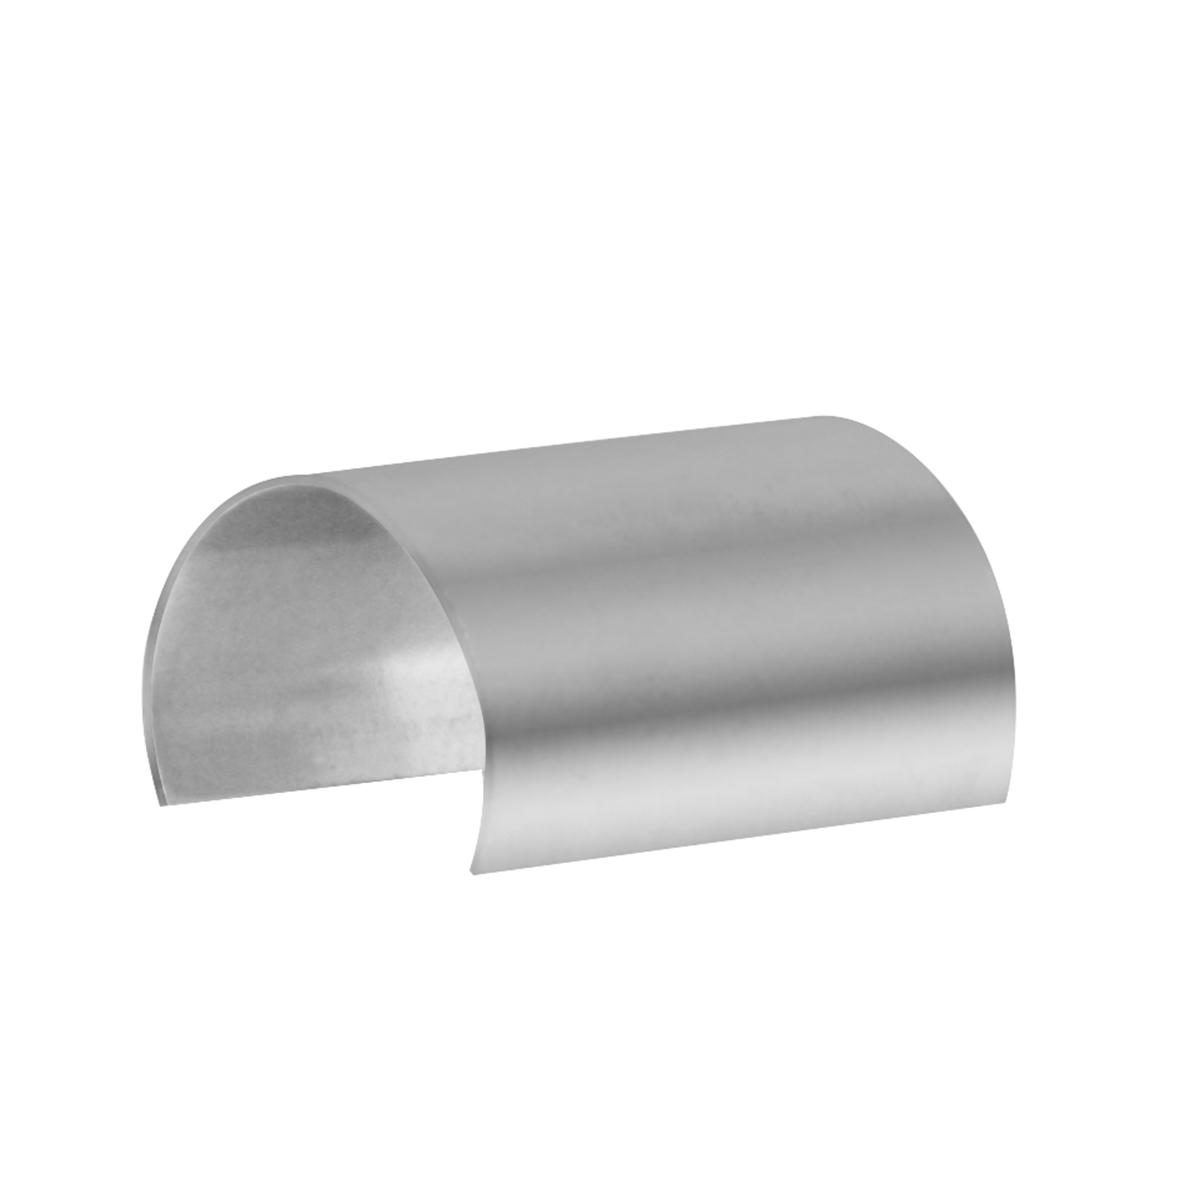 50171 Pete Stainless Steel Door Hinge Cover